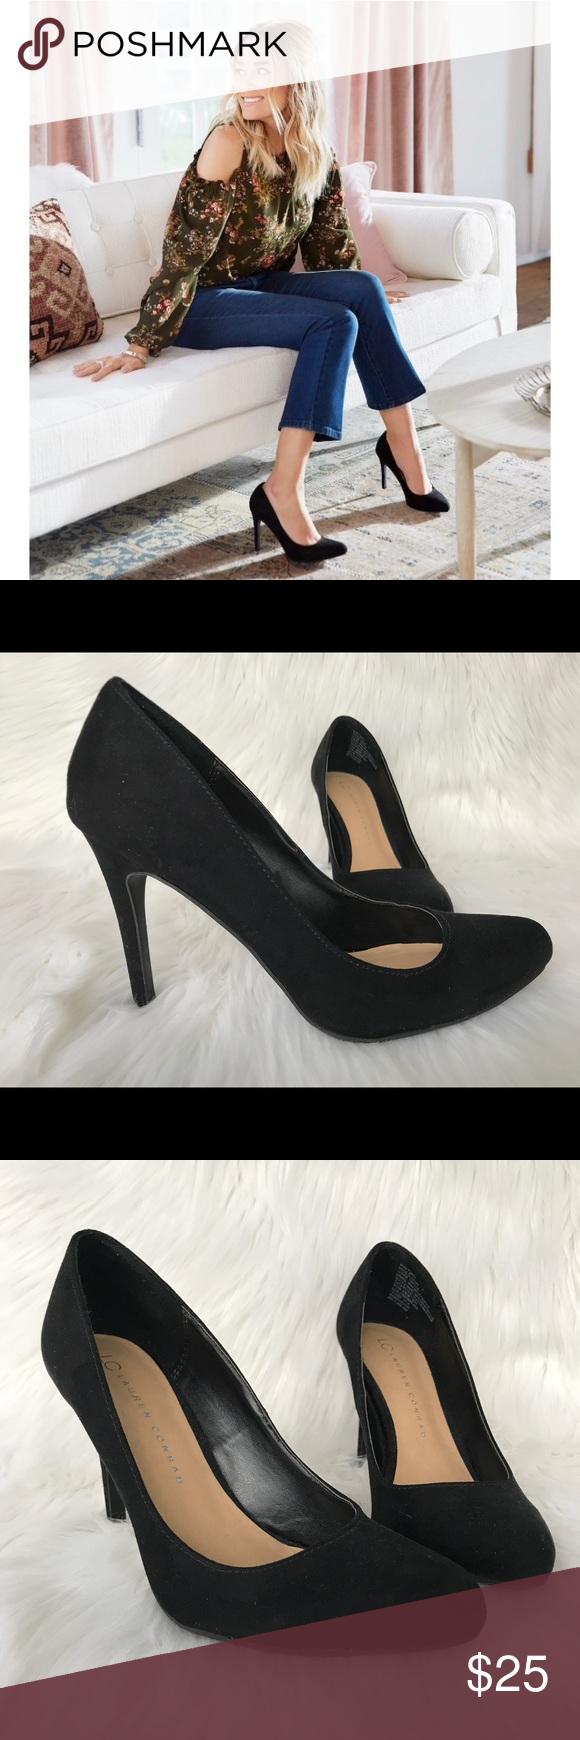 8b26a6bdb74 LC Lauren Conrad Black Almond Toe Pumps Shoes are a size 7 1/2 but ...